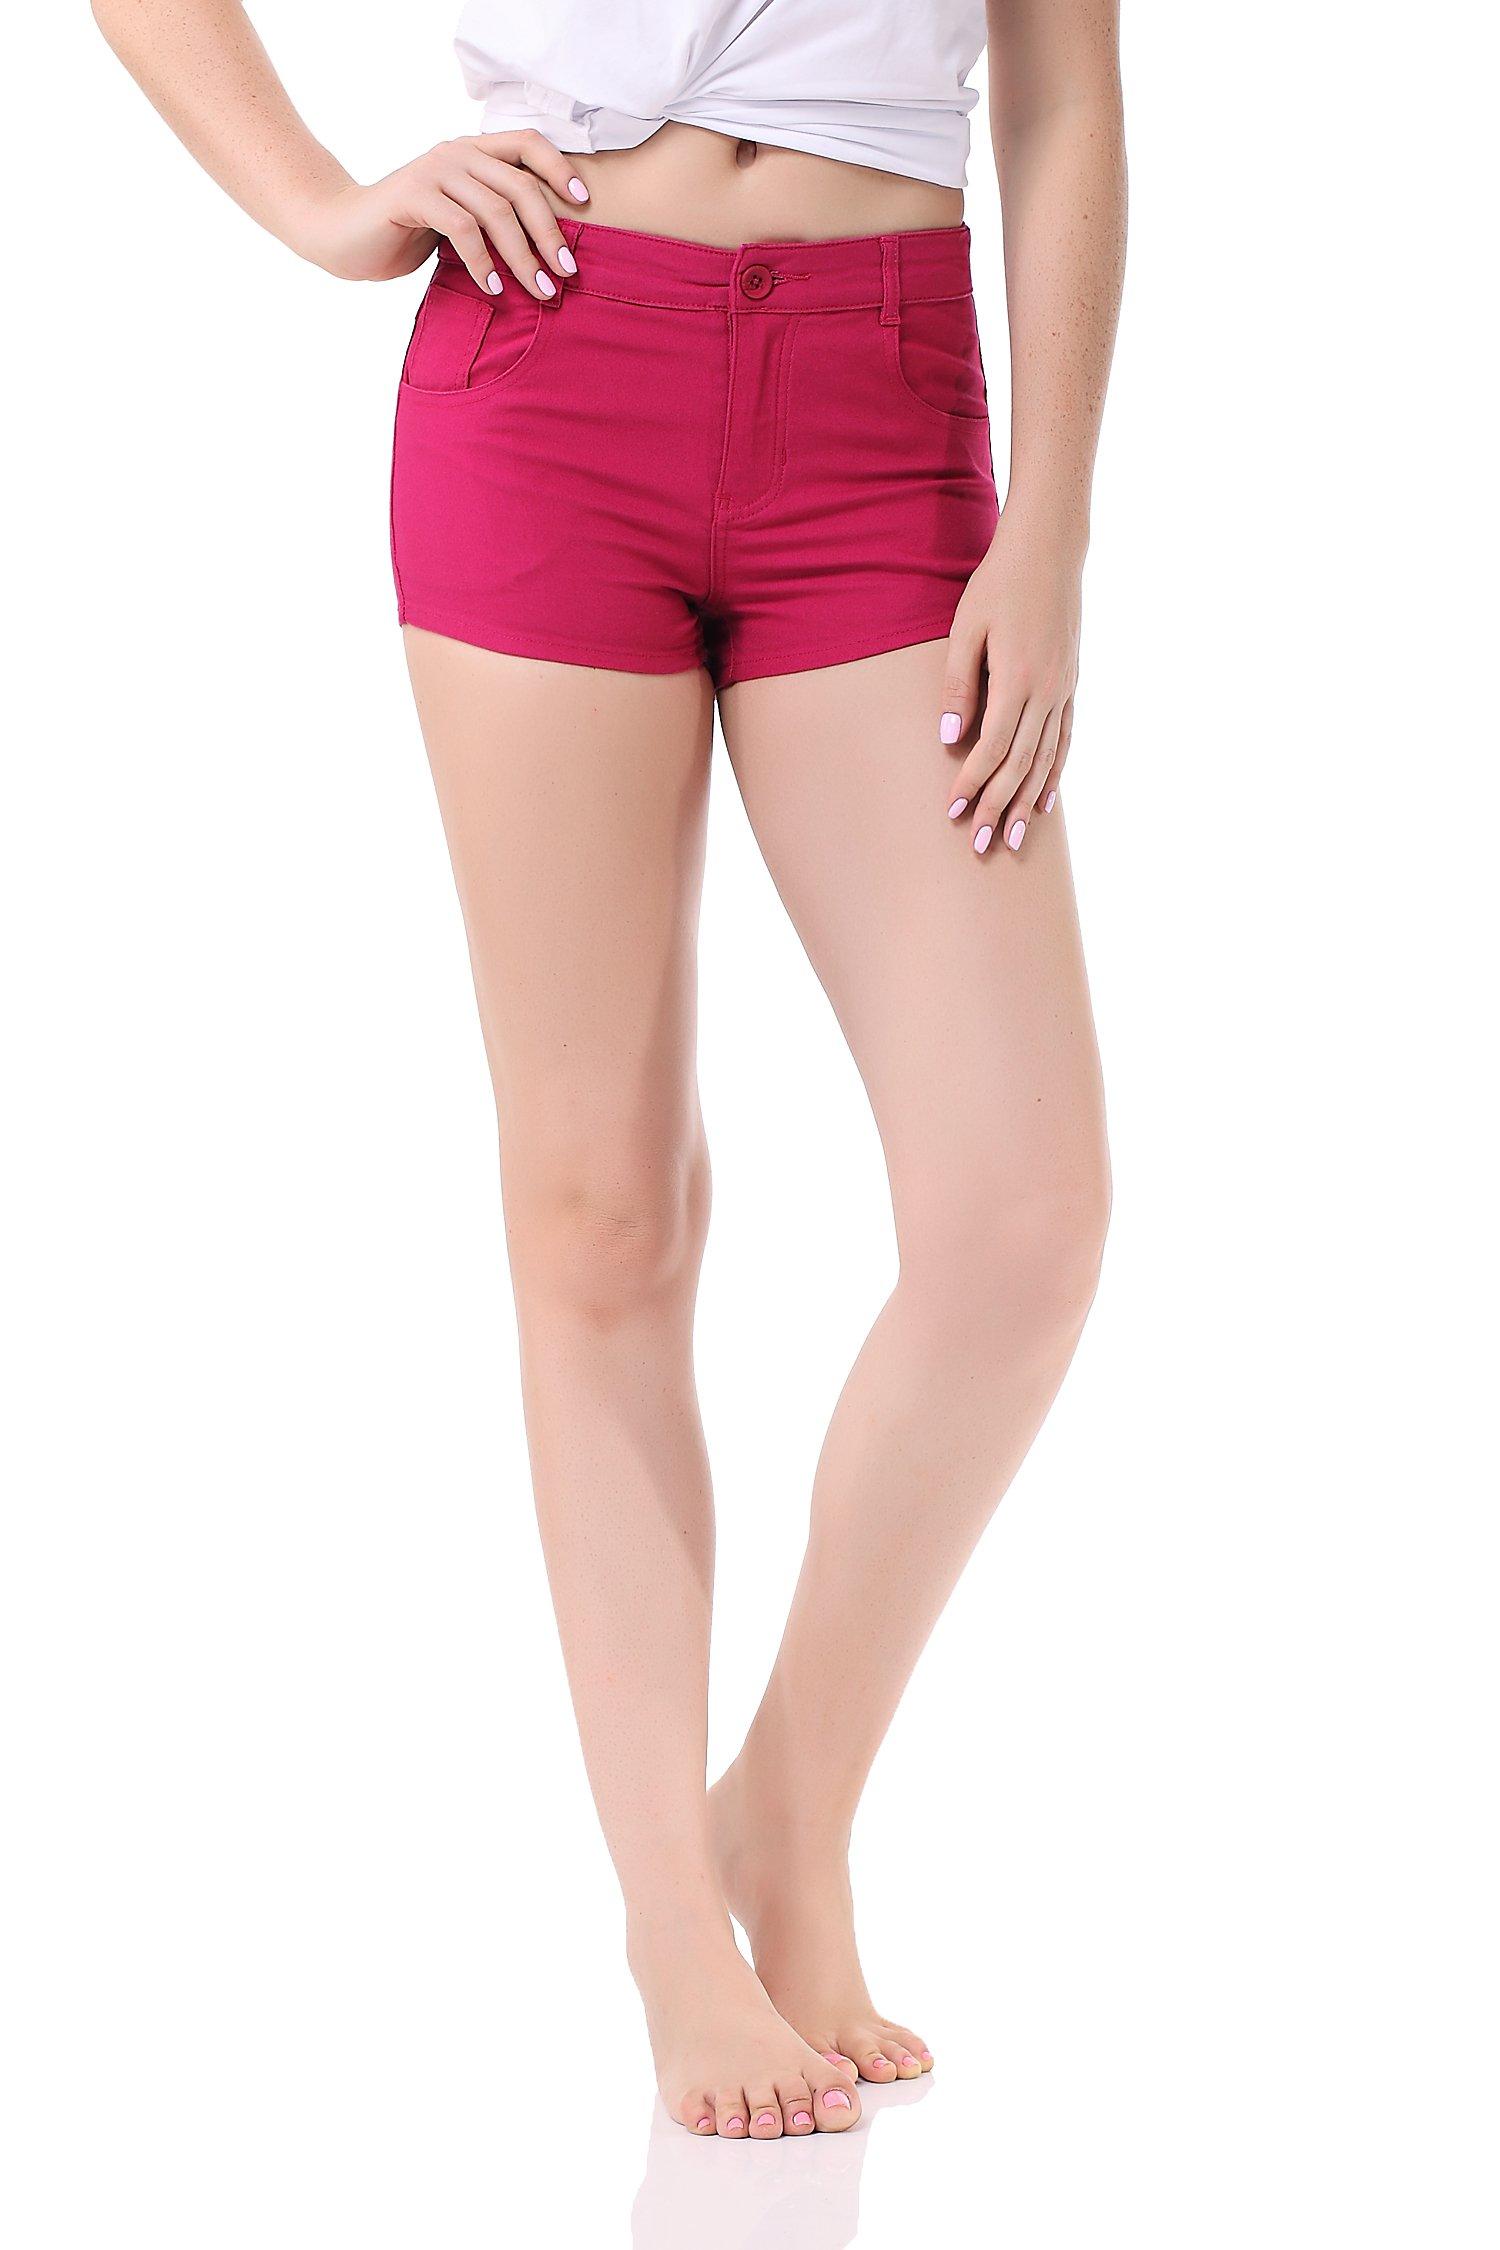 Pau1Hami1ton GP-09 Women's Bermuda Solid Summer Stretch Shorts (S,Purple)